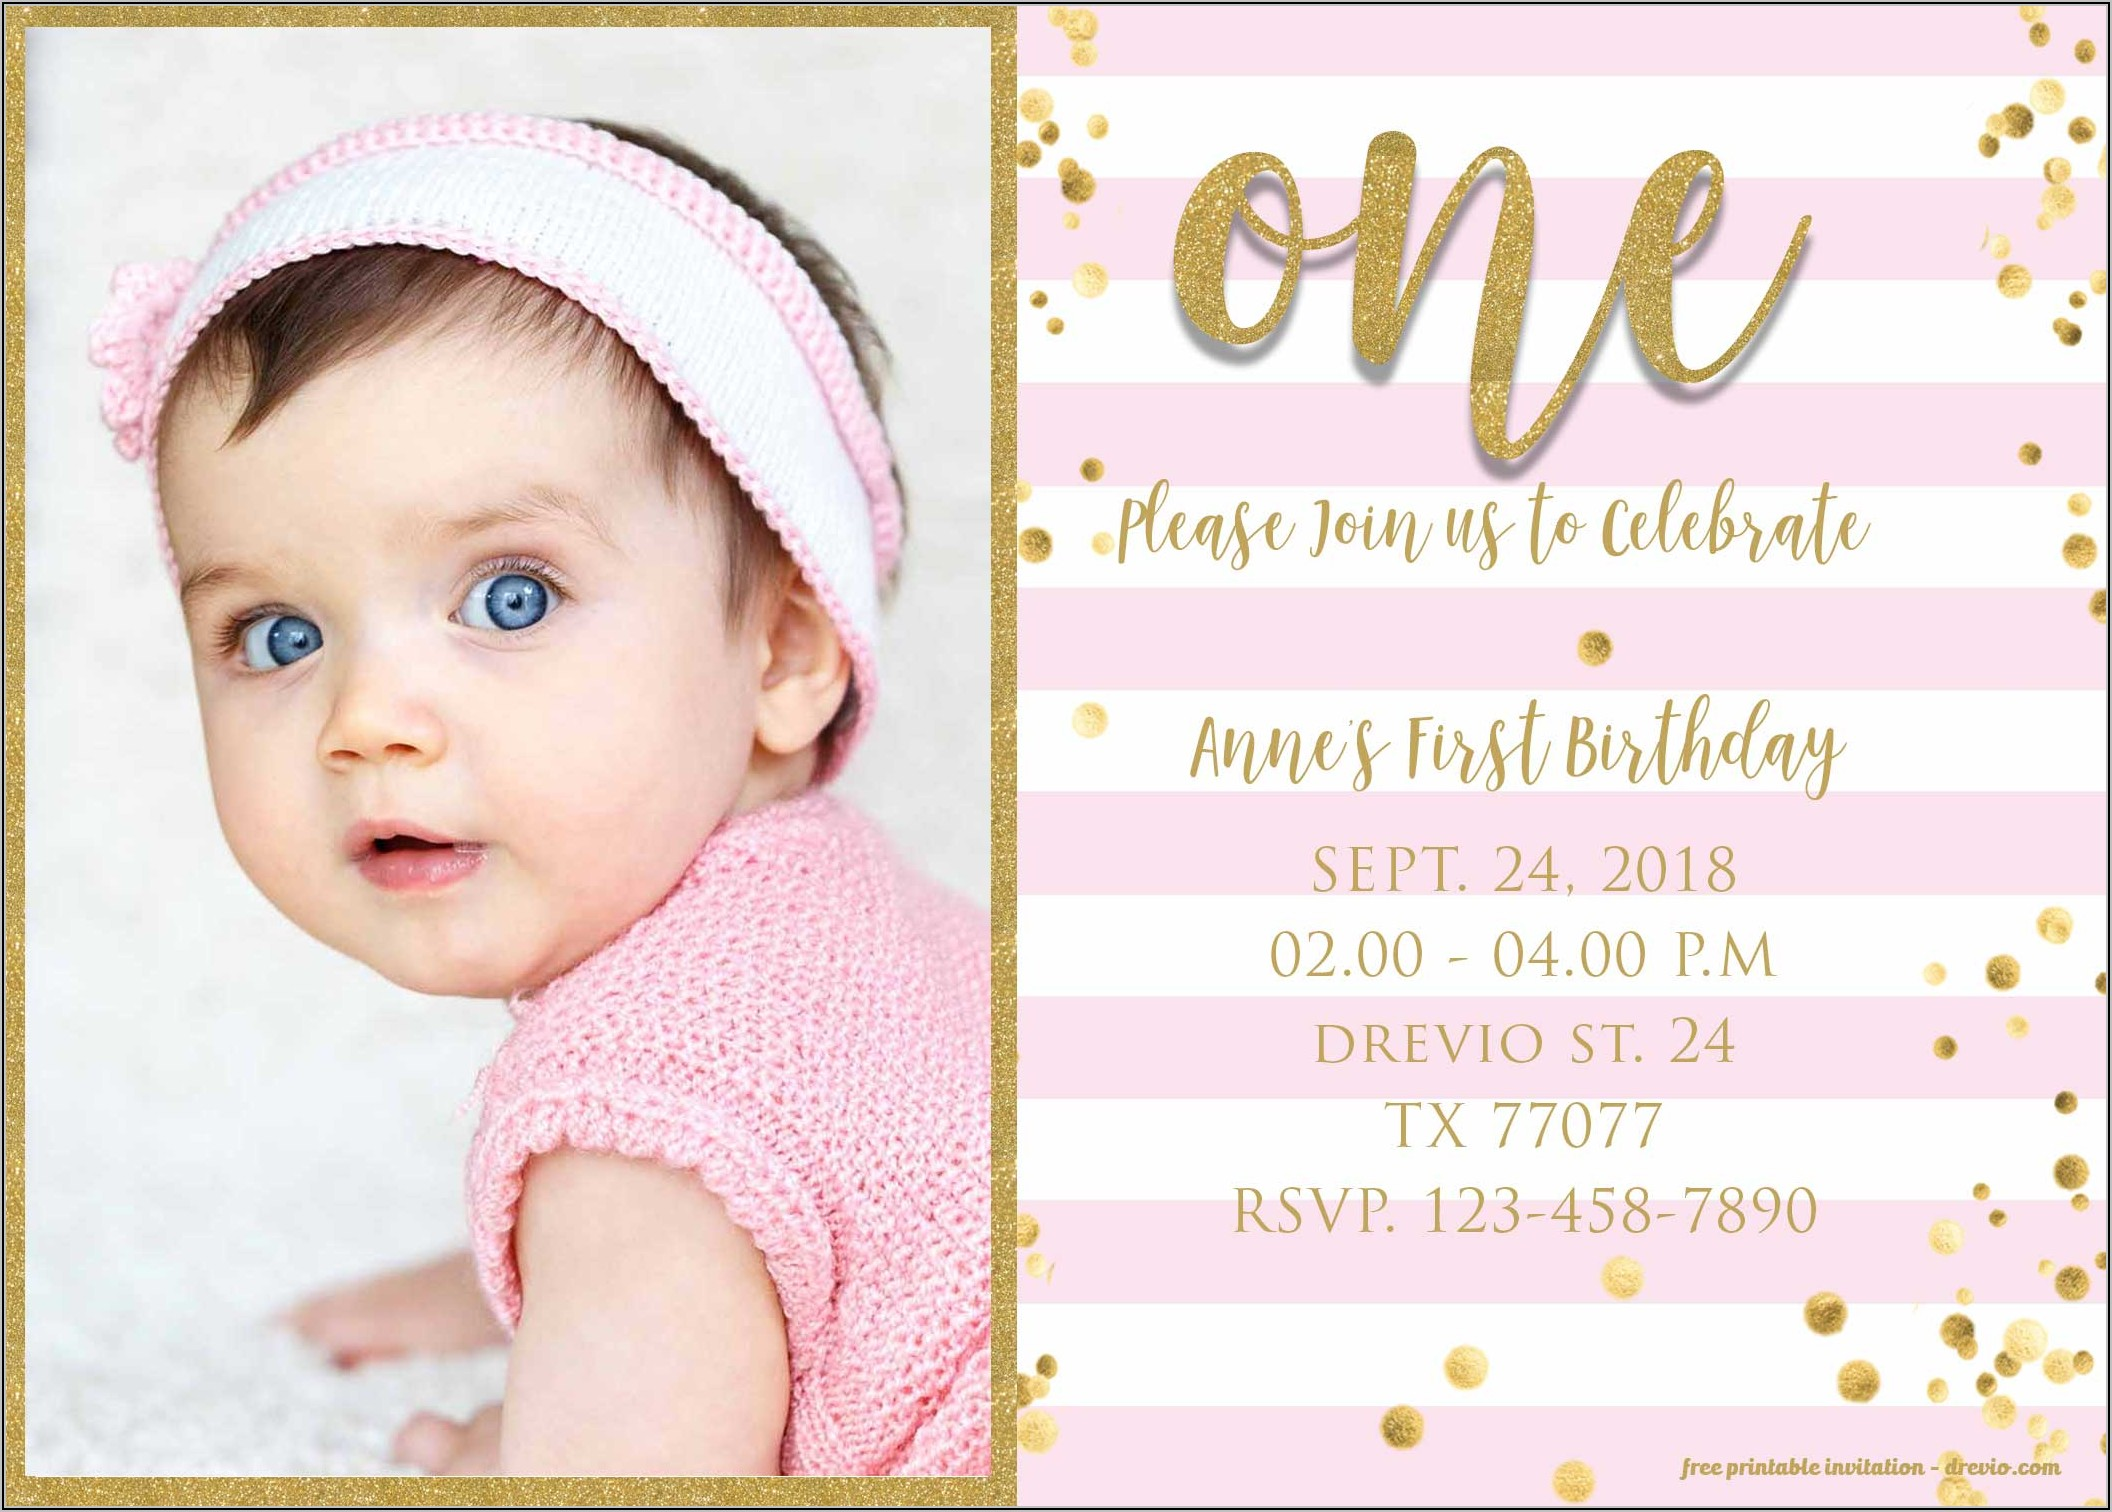 Templates For Birthday Invitations